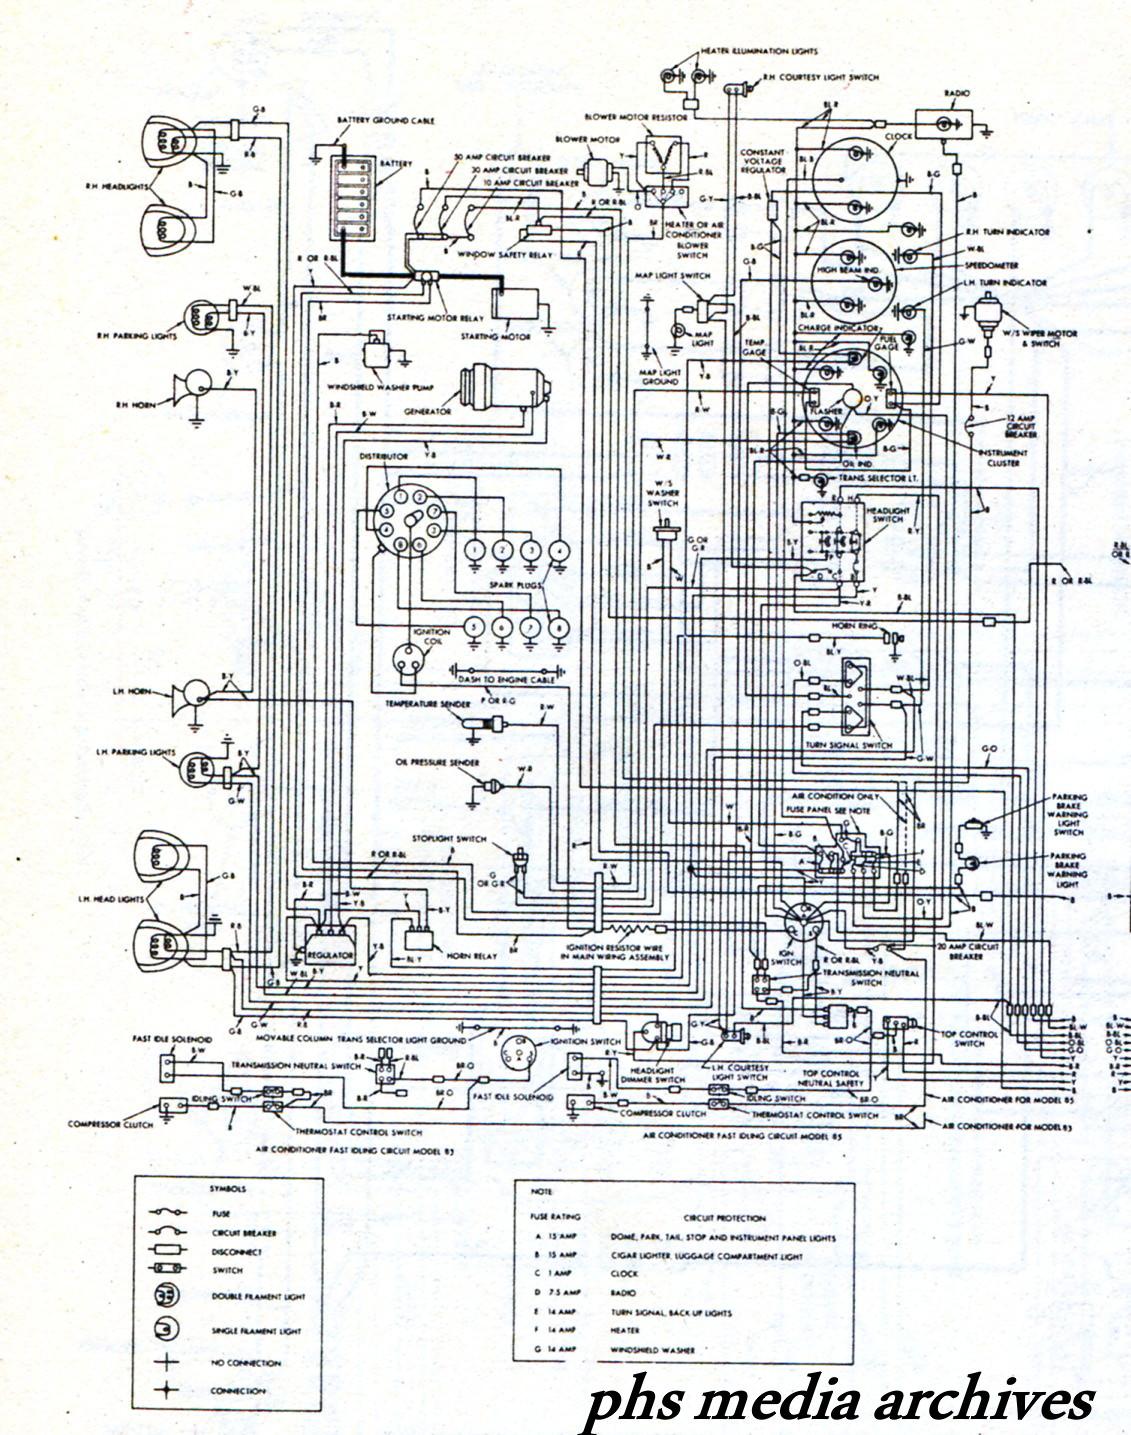 1963 pontiac wiring chart rh thepeoplestrust co uk 1963 pontiac bonneville wiring diagram 1963 pontiac grand prix wiring diagram [ 1131 x 1435 Pixel ]